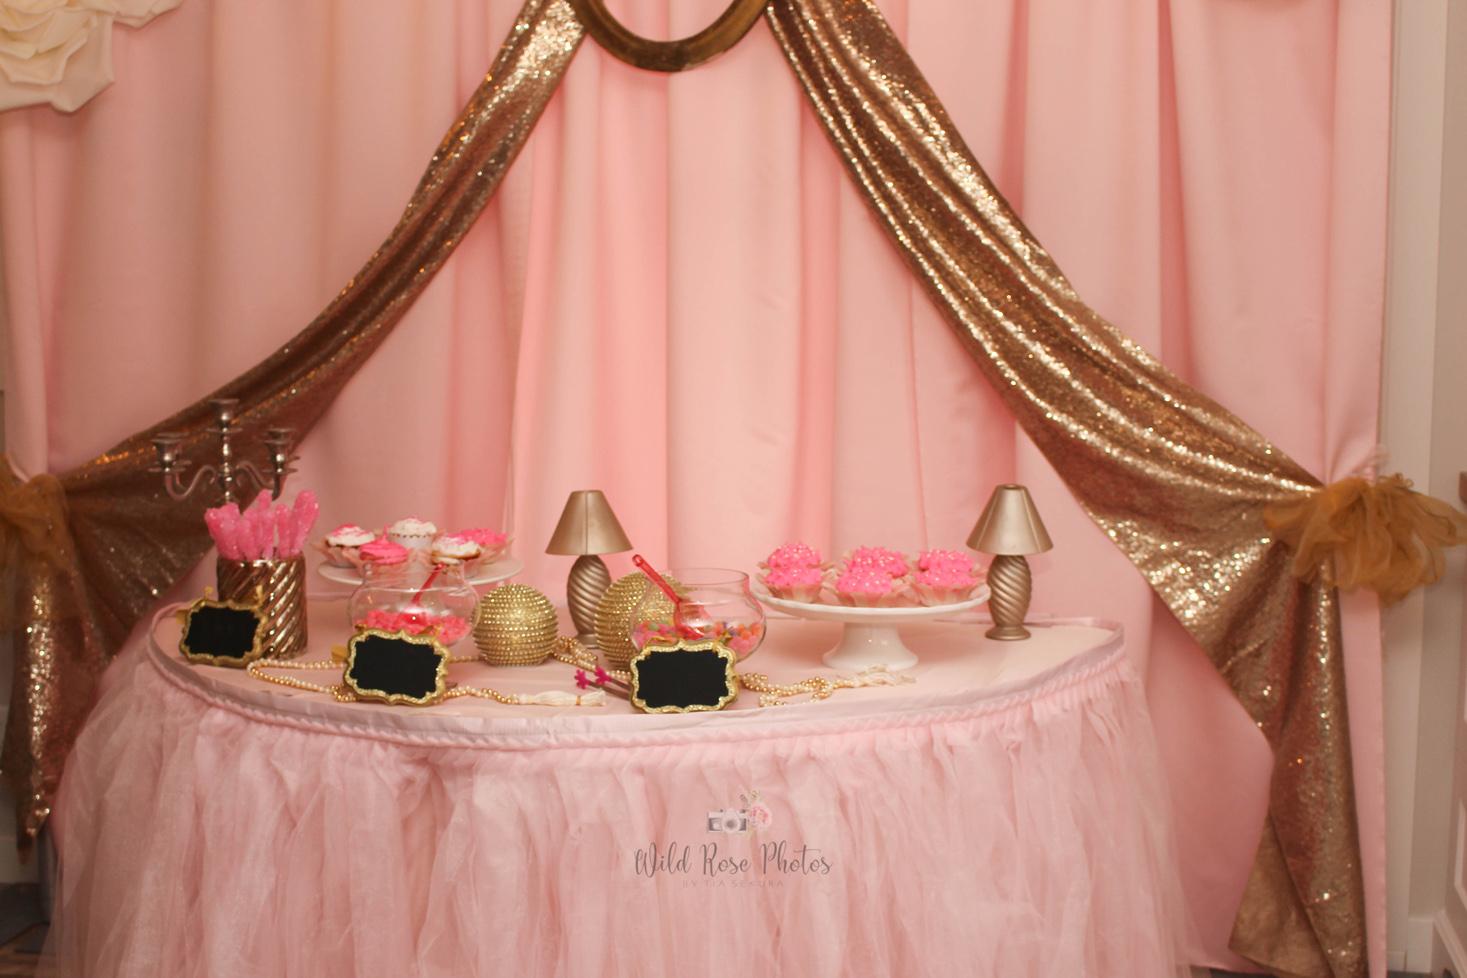 Princess-Party-3-web.jpg